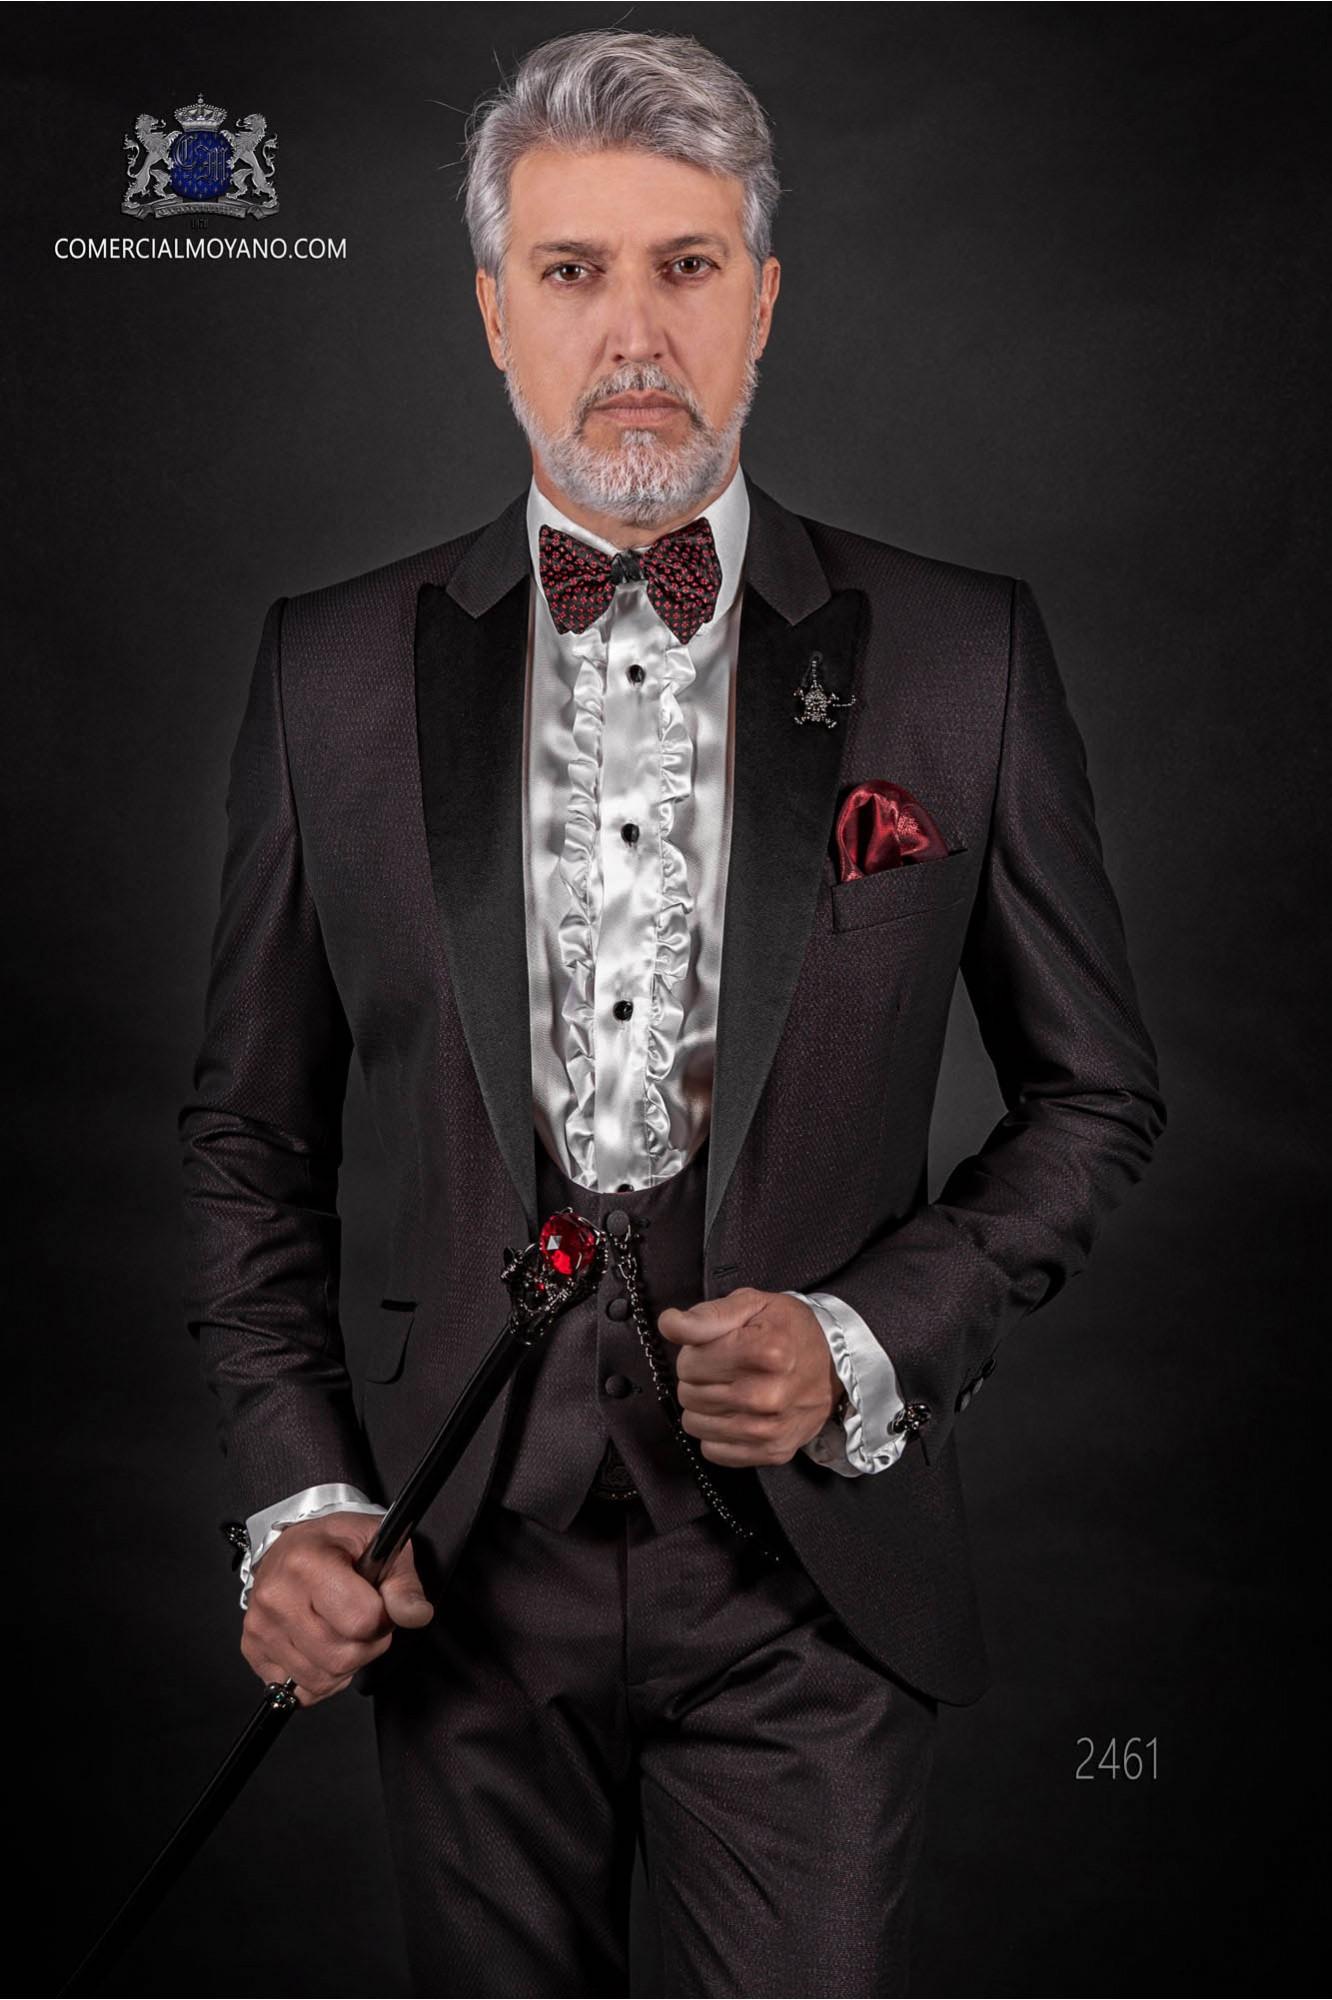 "Traje de novio italiano de moda con moderno corte ""Slim"". Modelo solapa punta con un botón, estilo esmoquin"